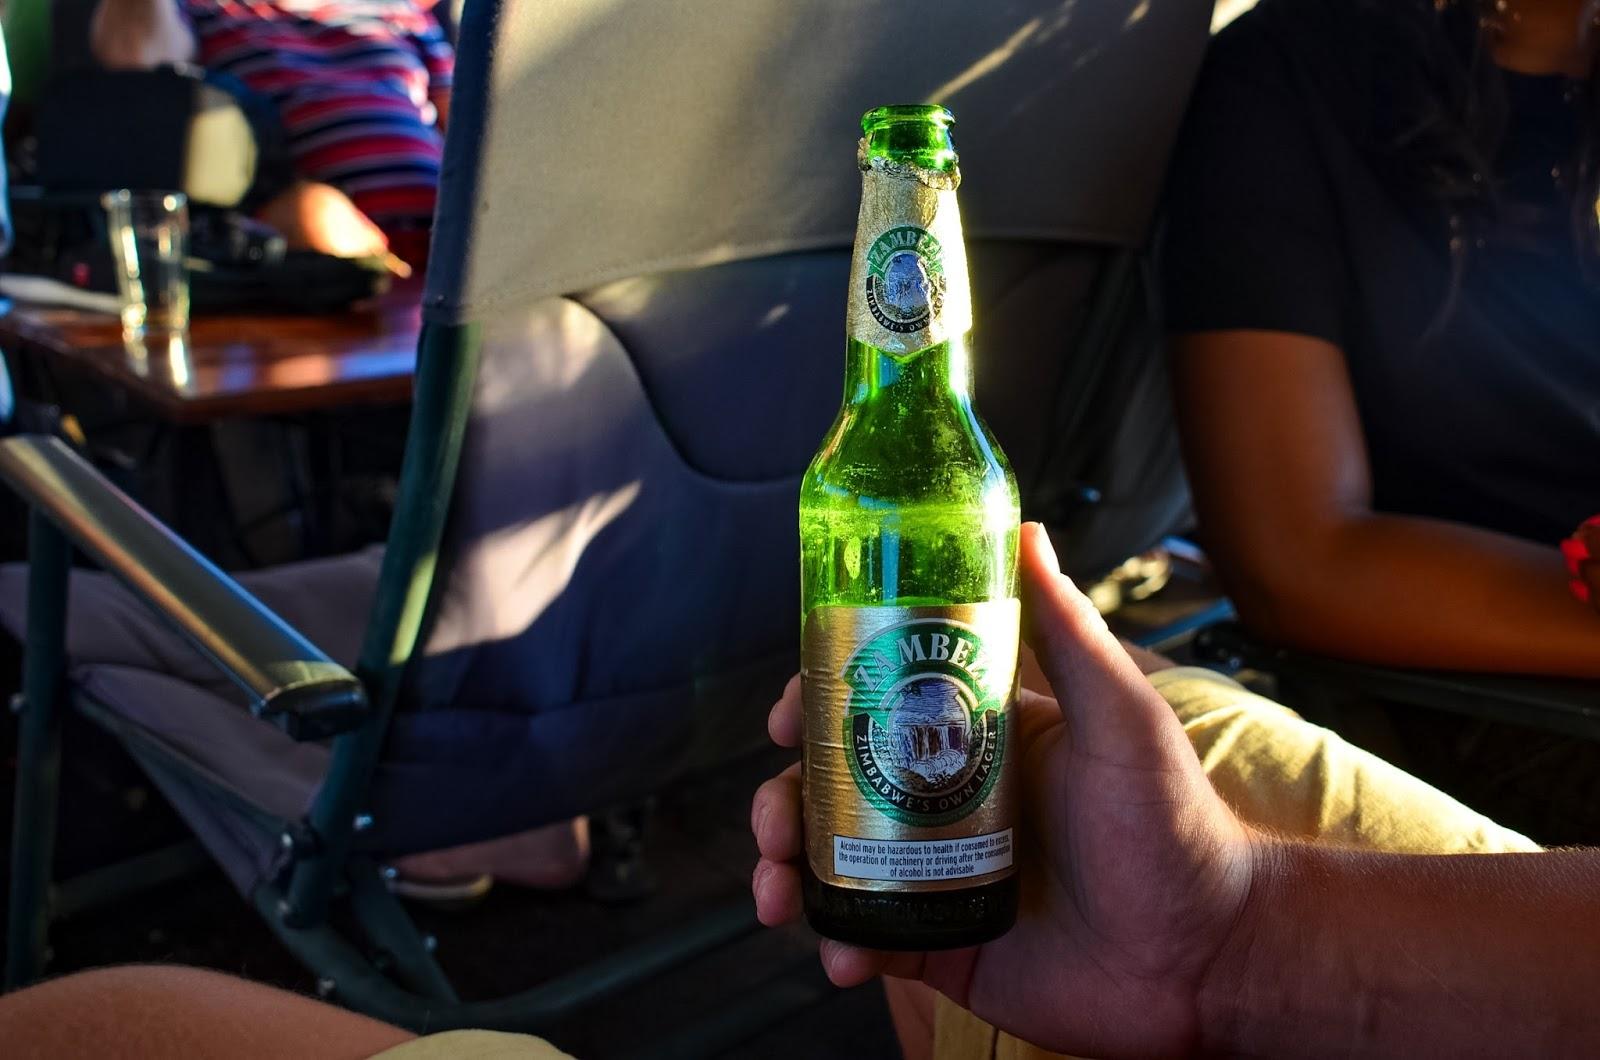 zambezi's local beer